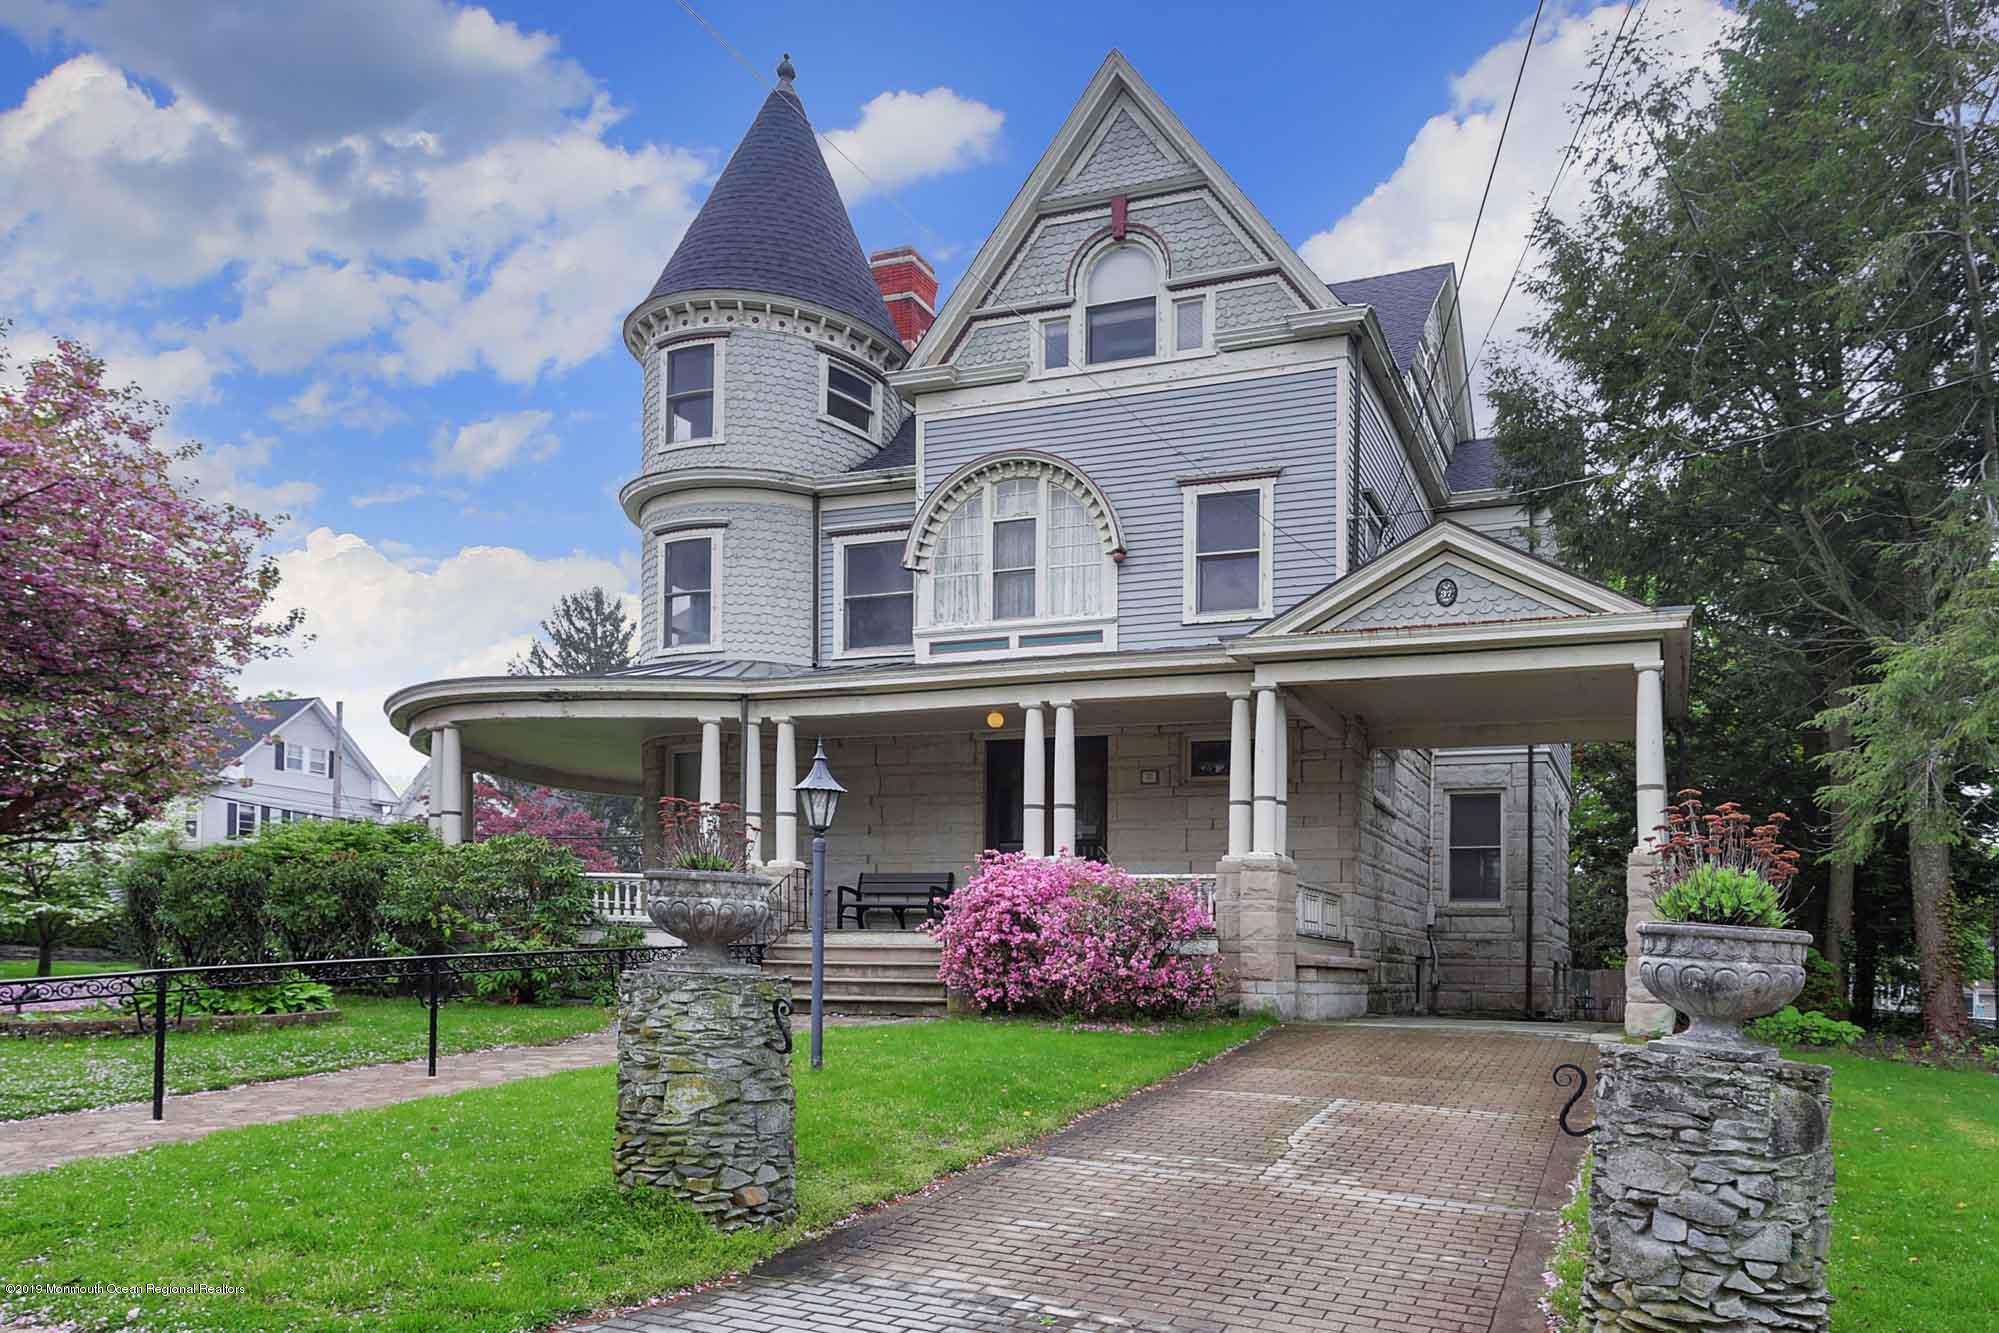 Photo of E Washington Avenue, Atlantic Highlands, NJ 07716